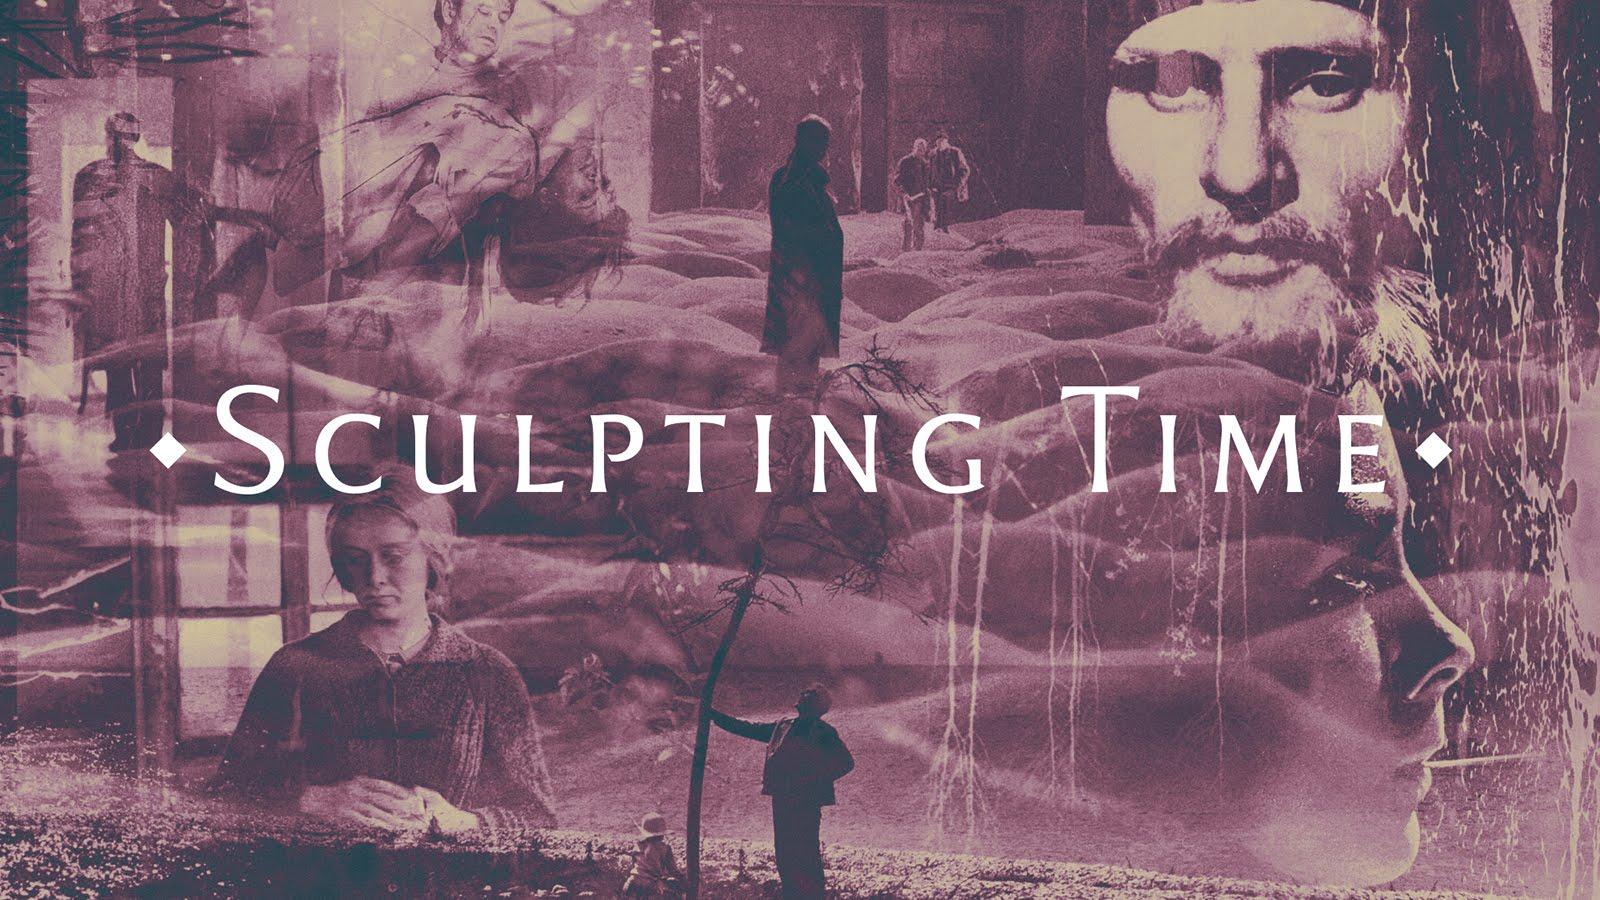 Sculpting timejpg